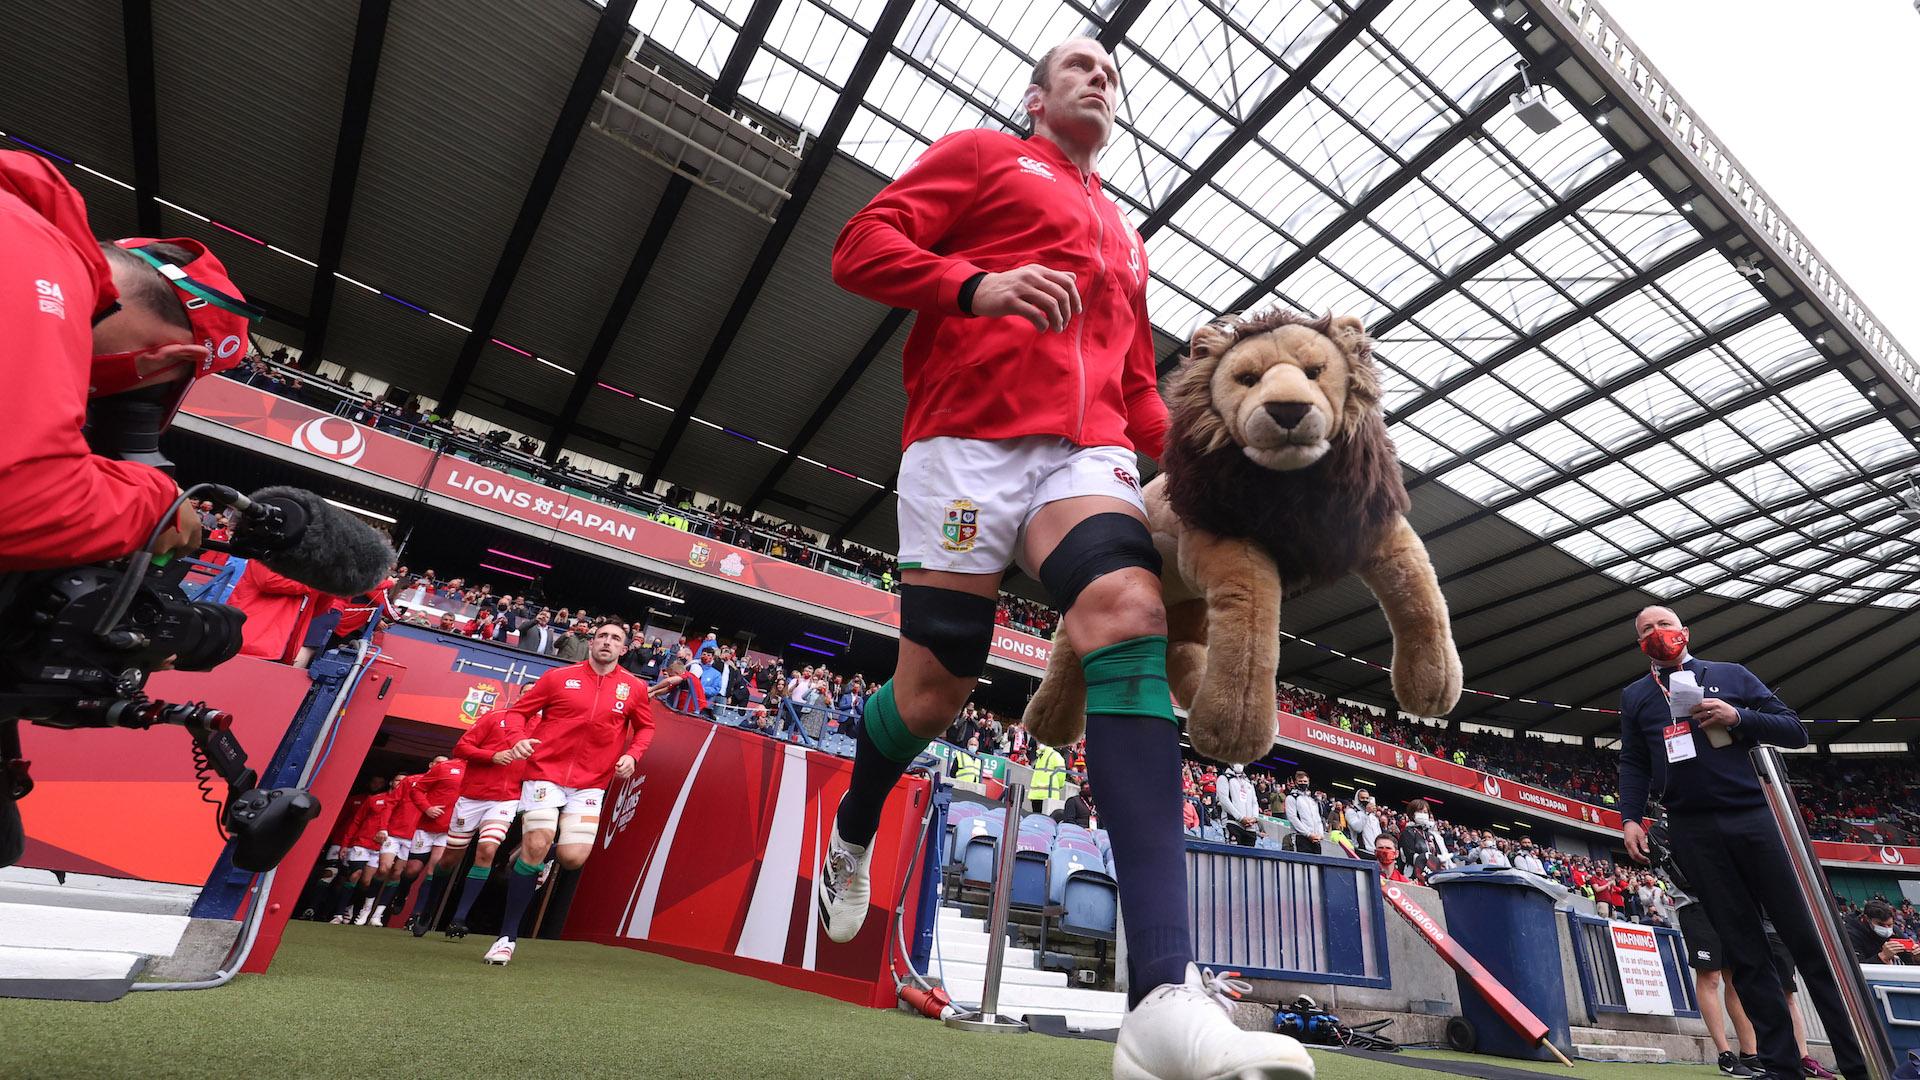 Alun Wyn Jones runs out into Murrayfield with Mascot BIL